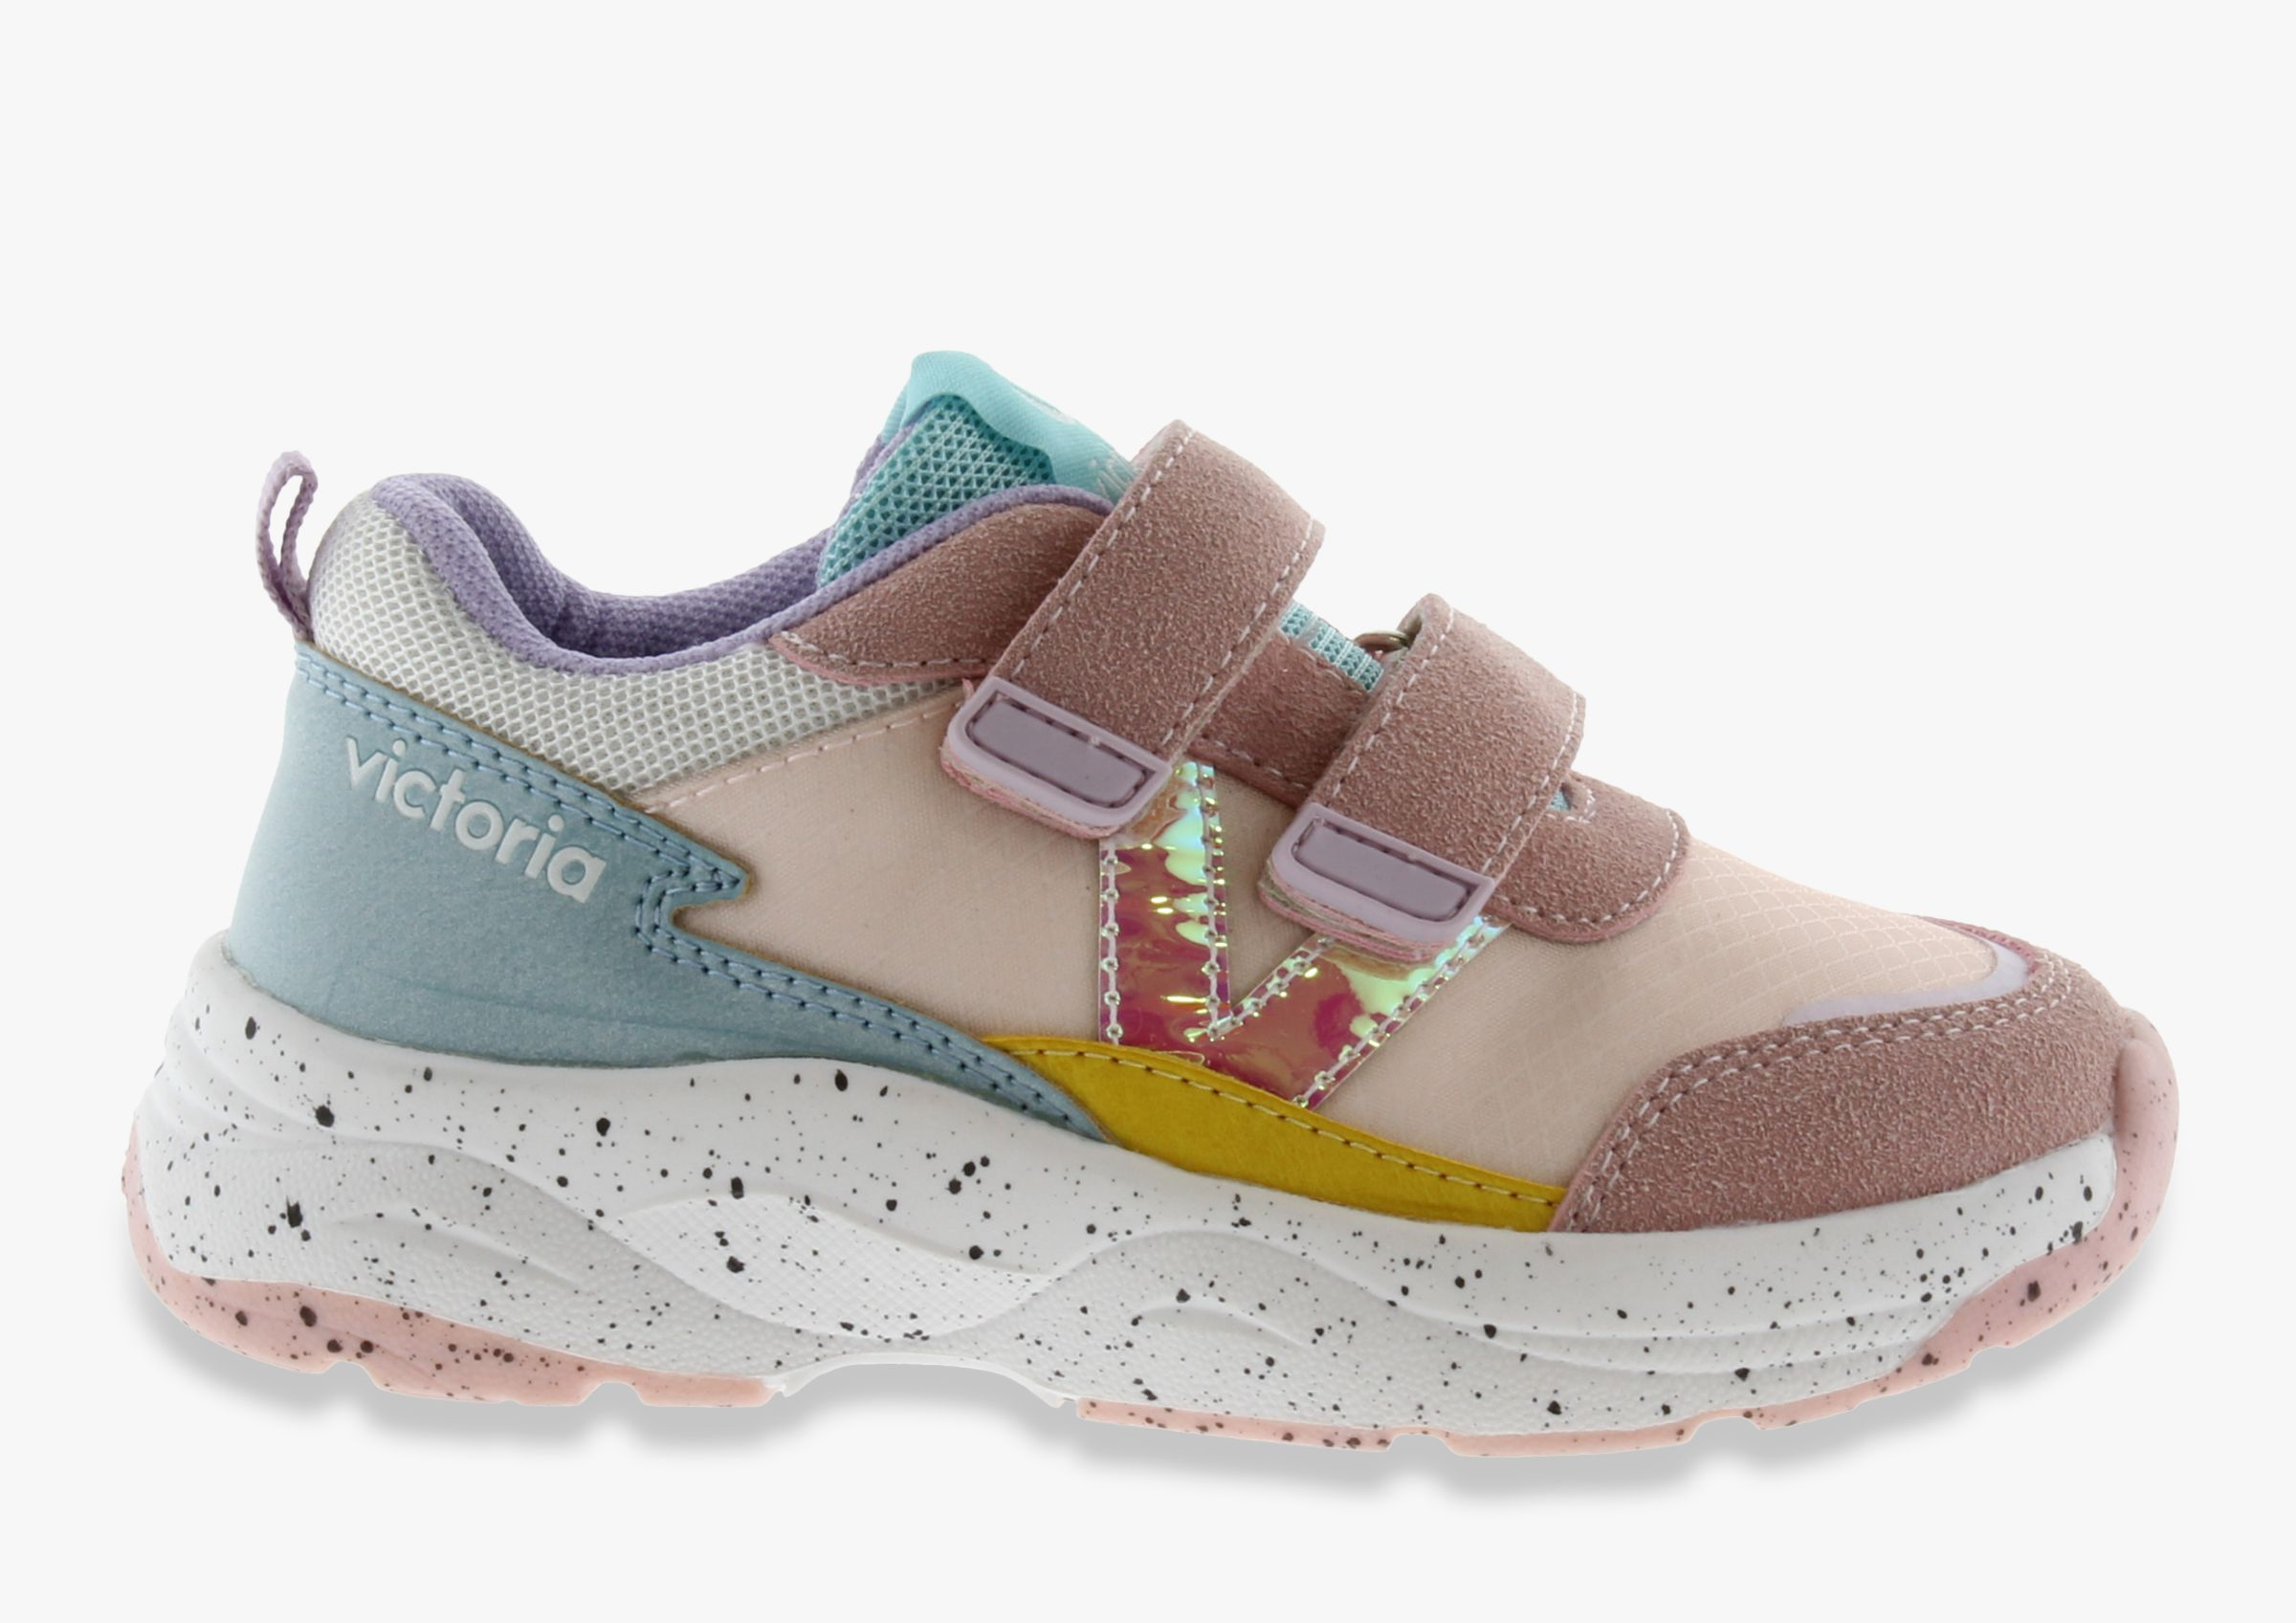 Victoria Shoes Victoria Shoes Children's Veta Riptape Trainers